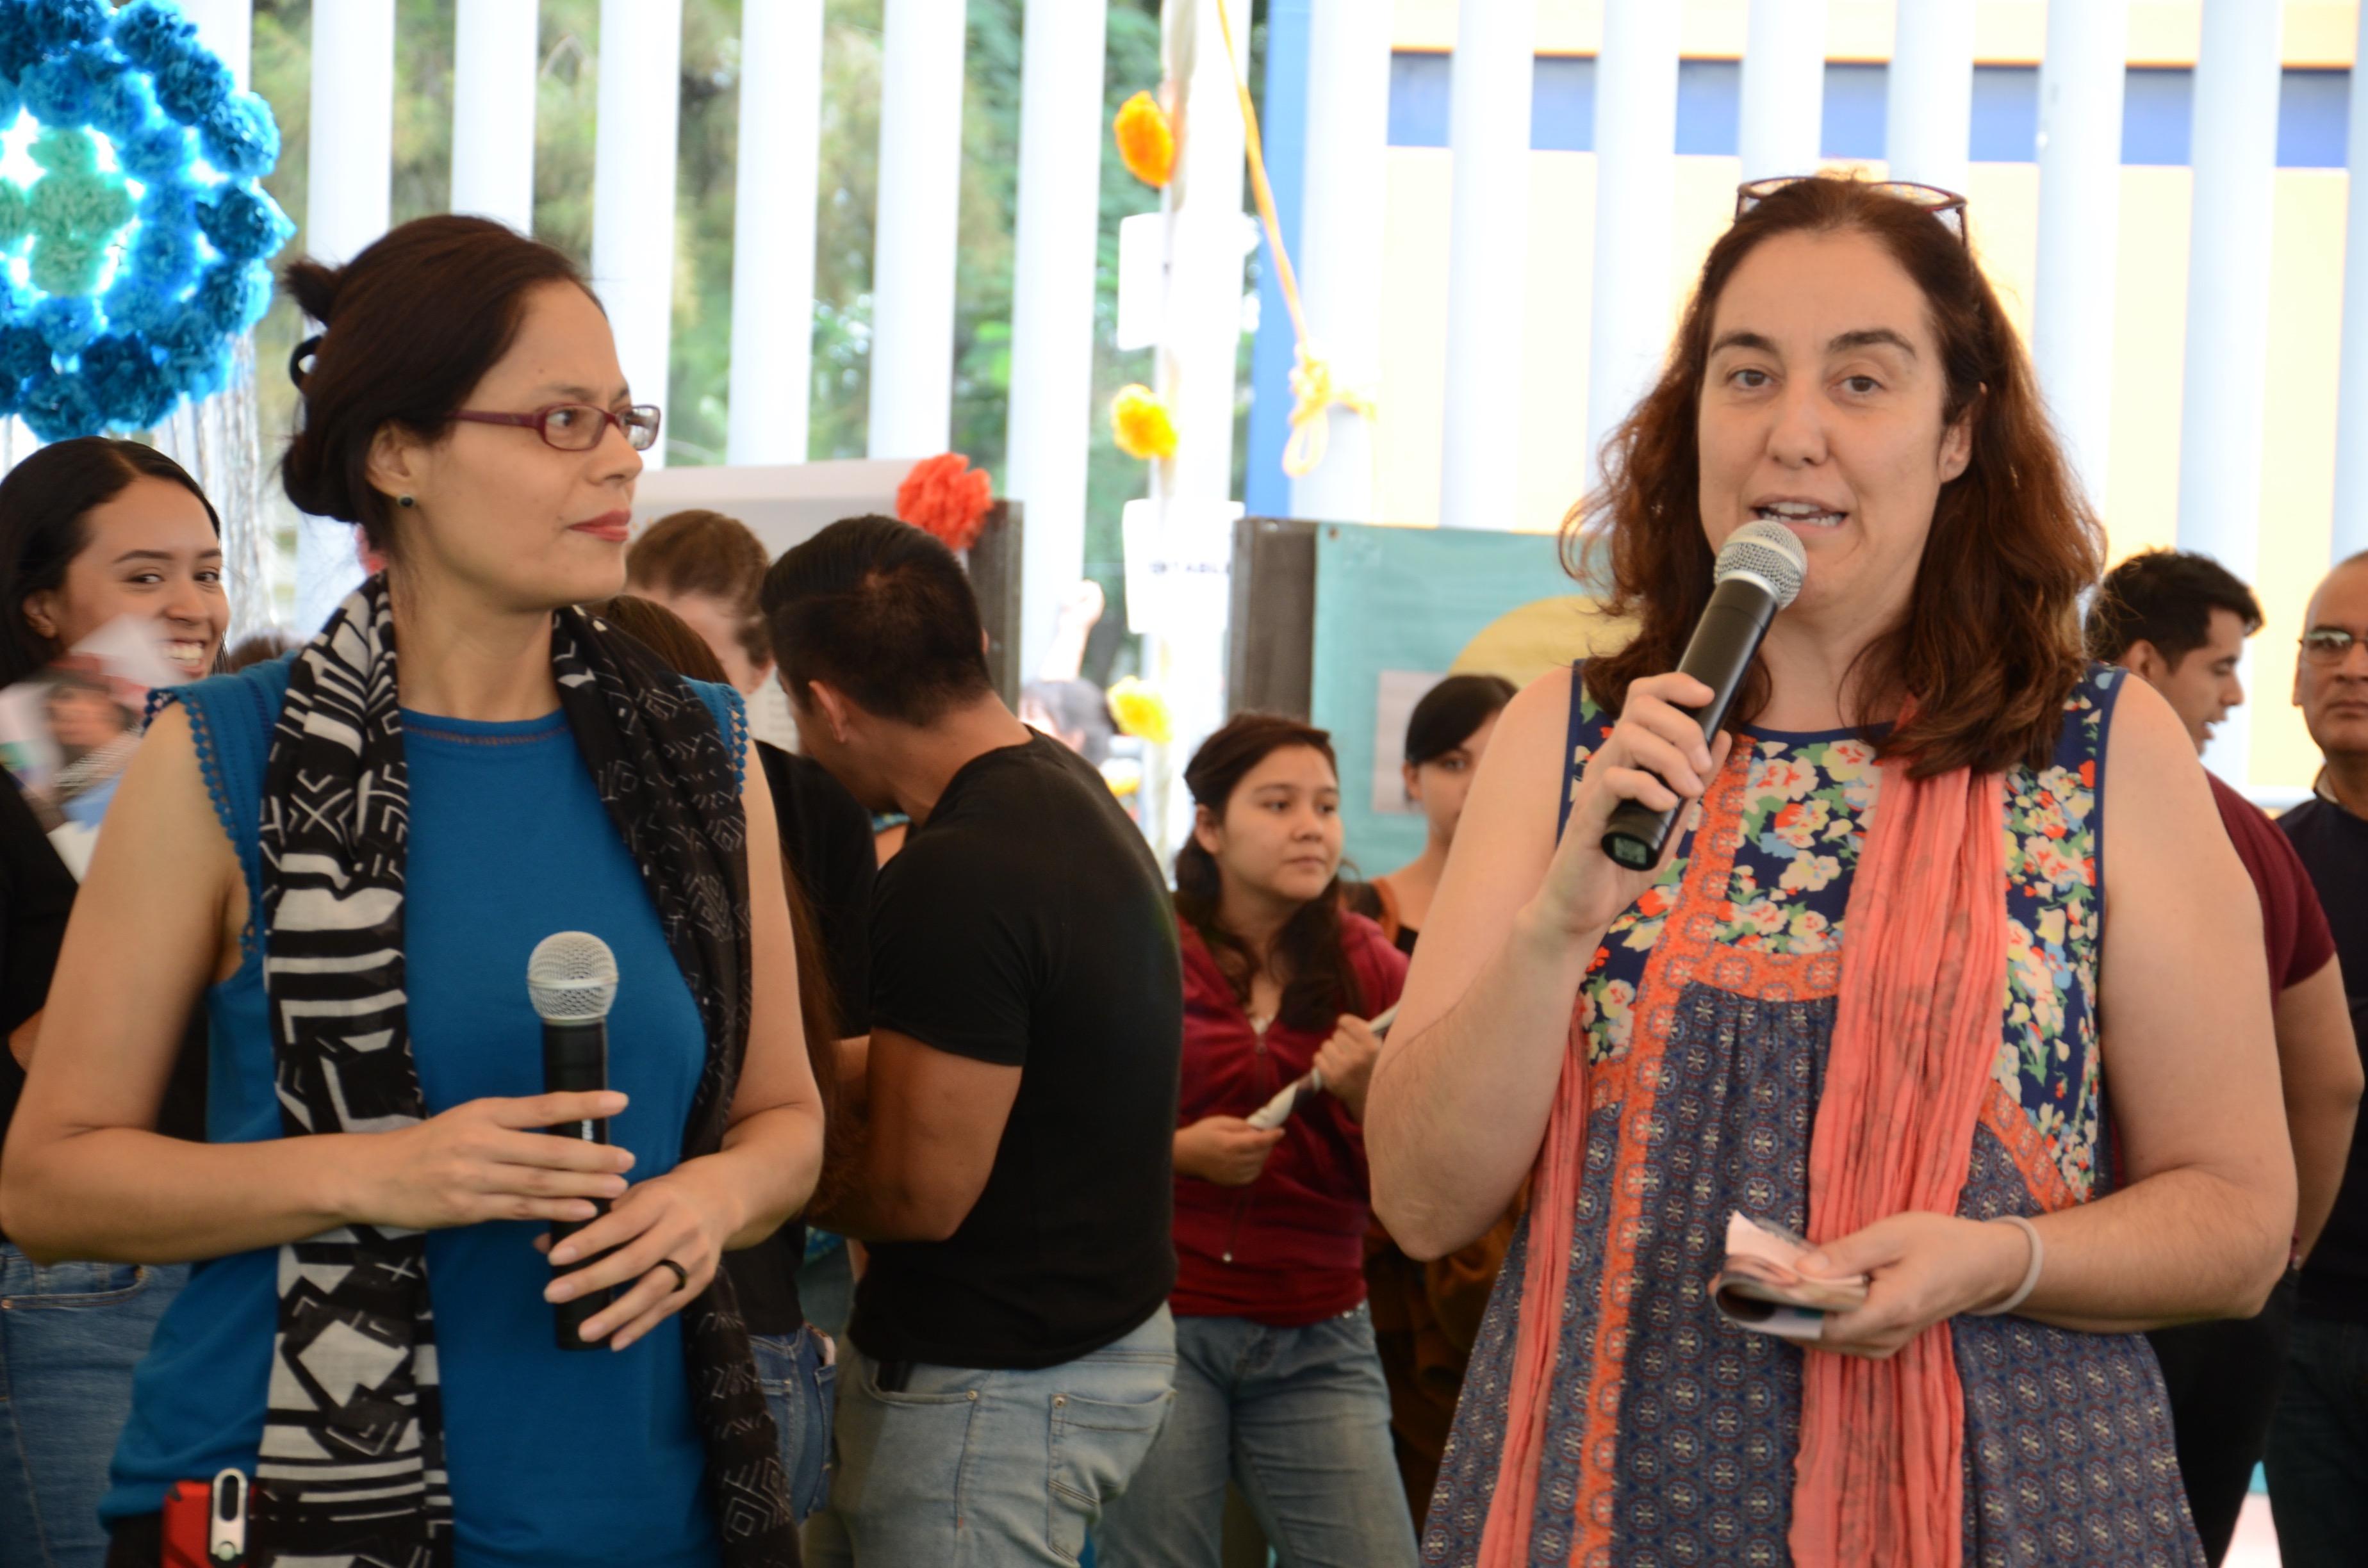 Dra Bárbara Vizmanos al micrófono inaugurando el evento